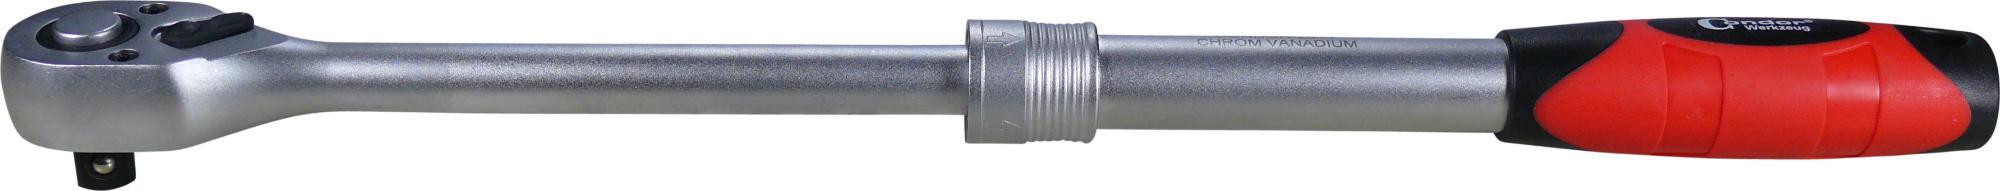 "Račňa teleskopická, 1/2"", 300-440 mm"